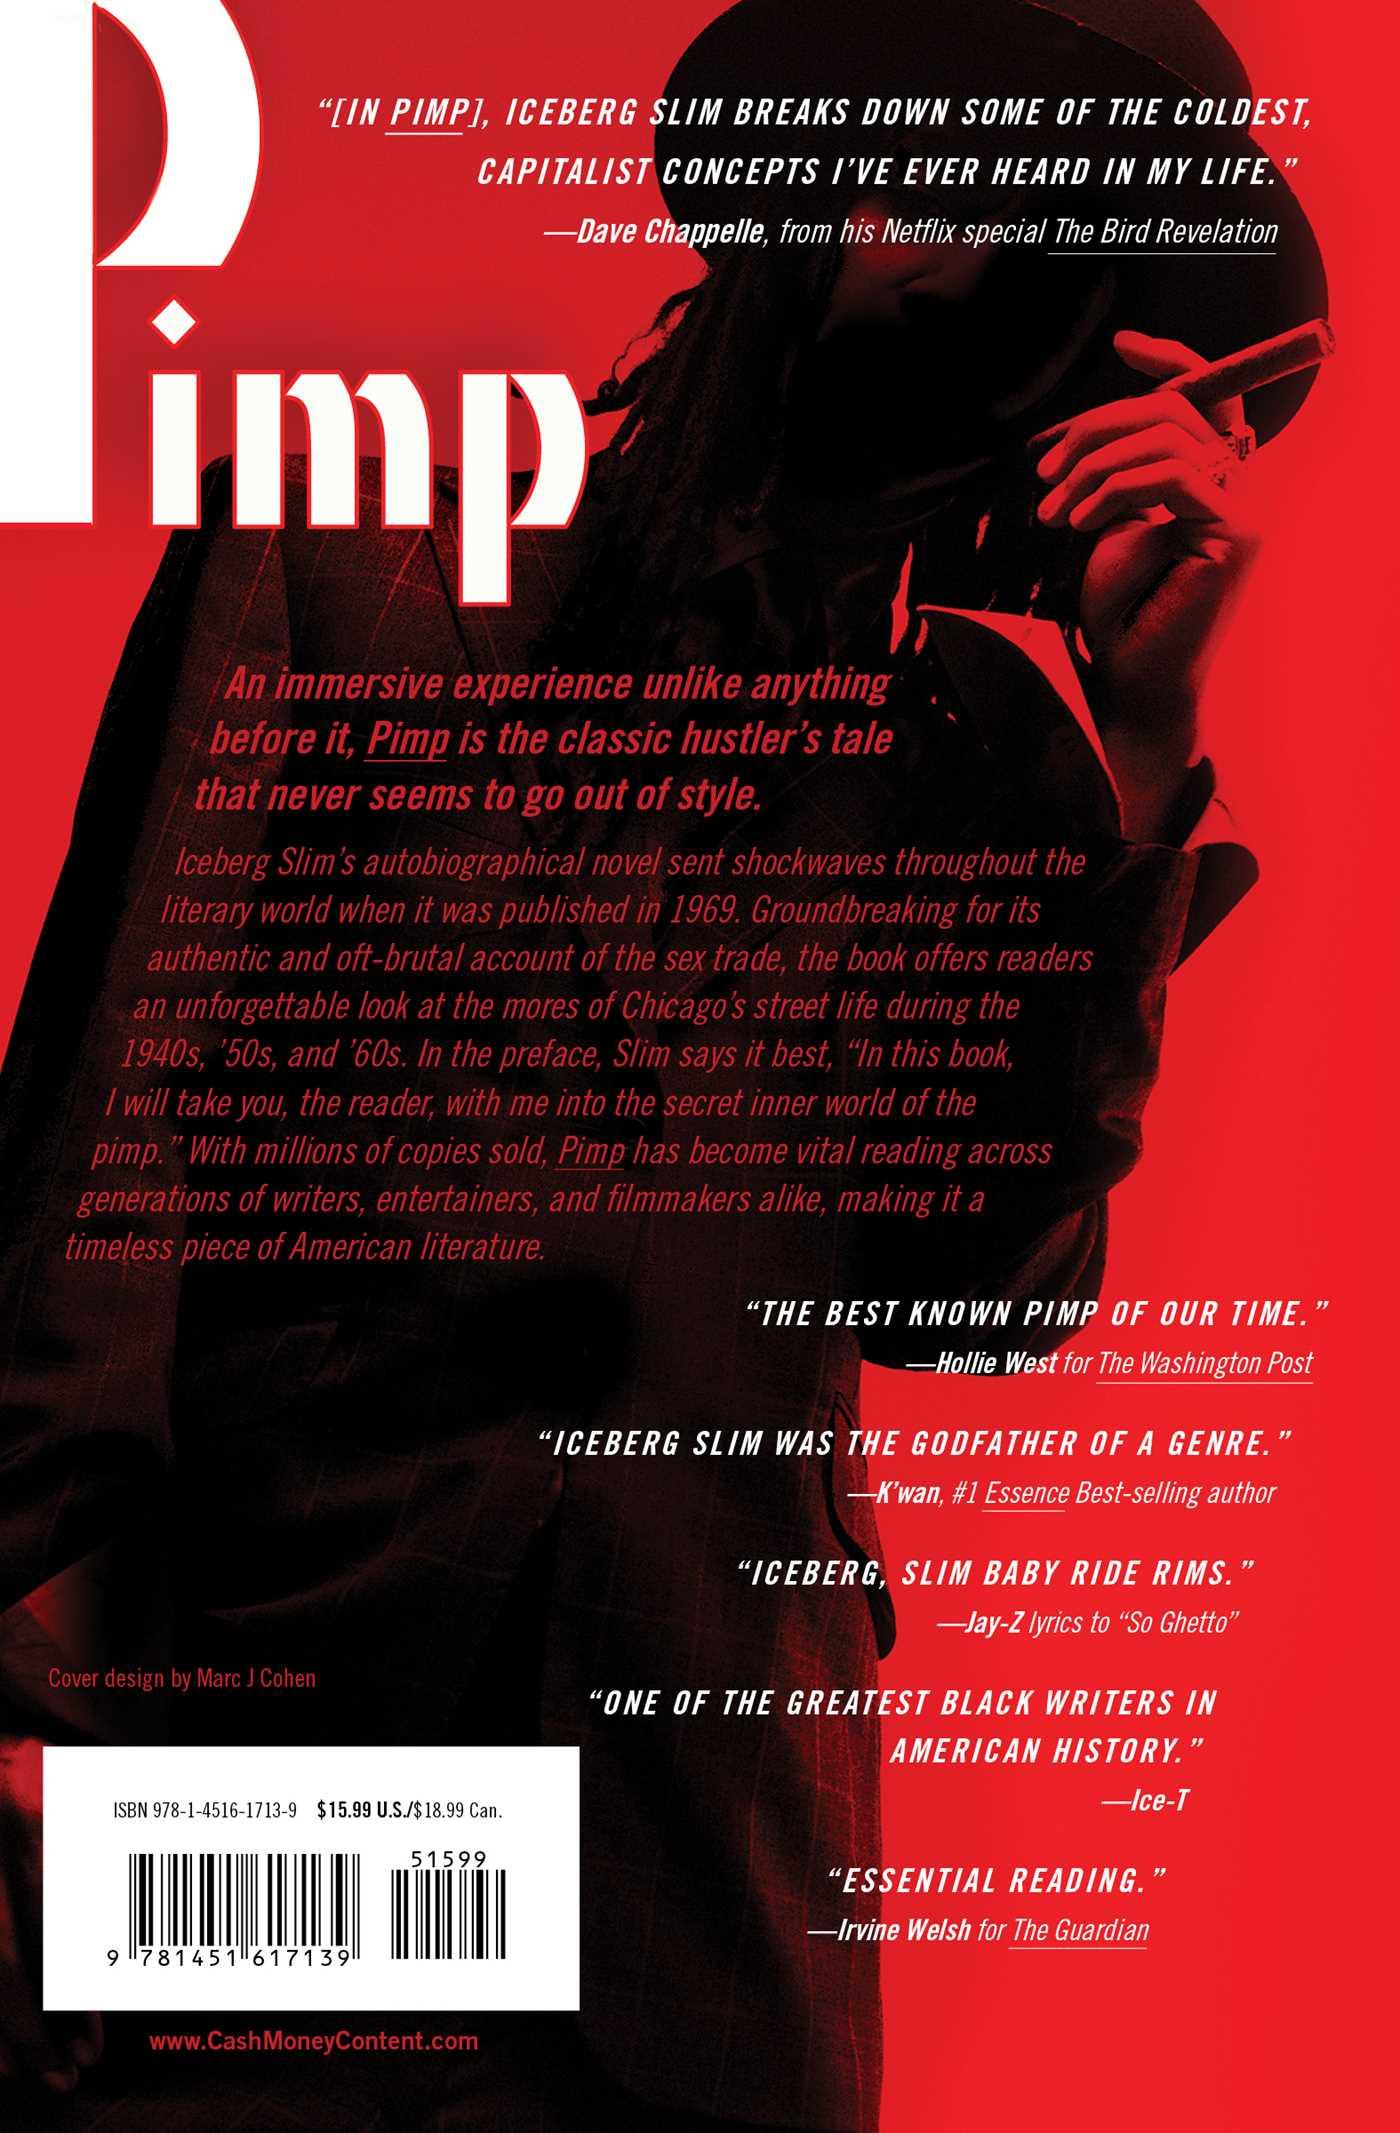 Pimp 9781451617139 hr back